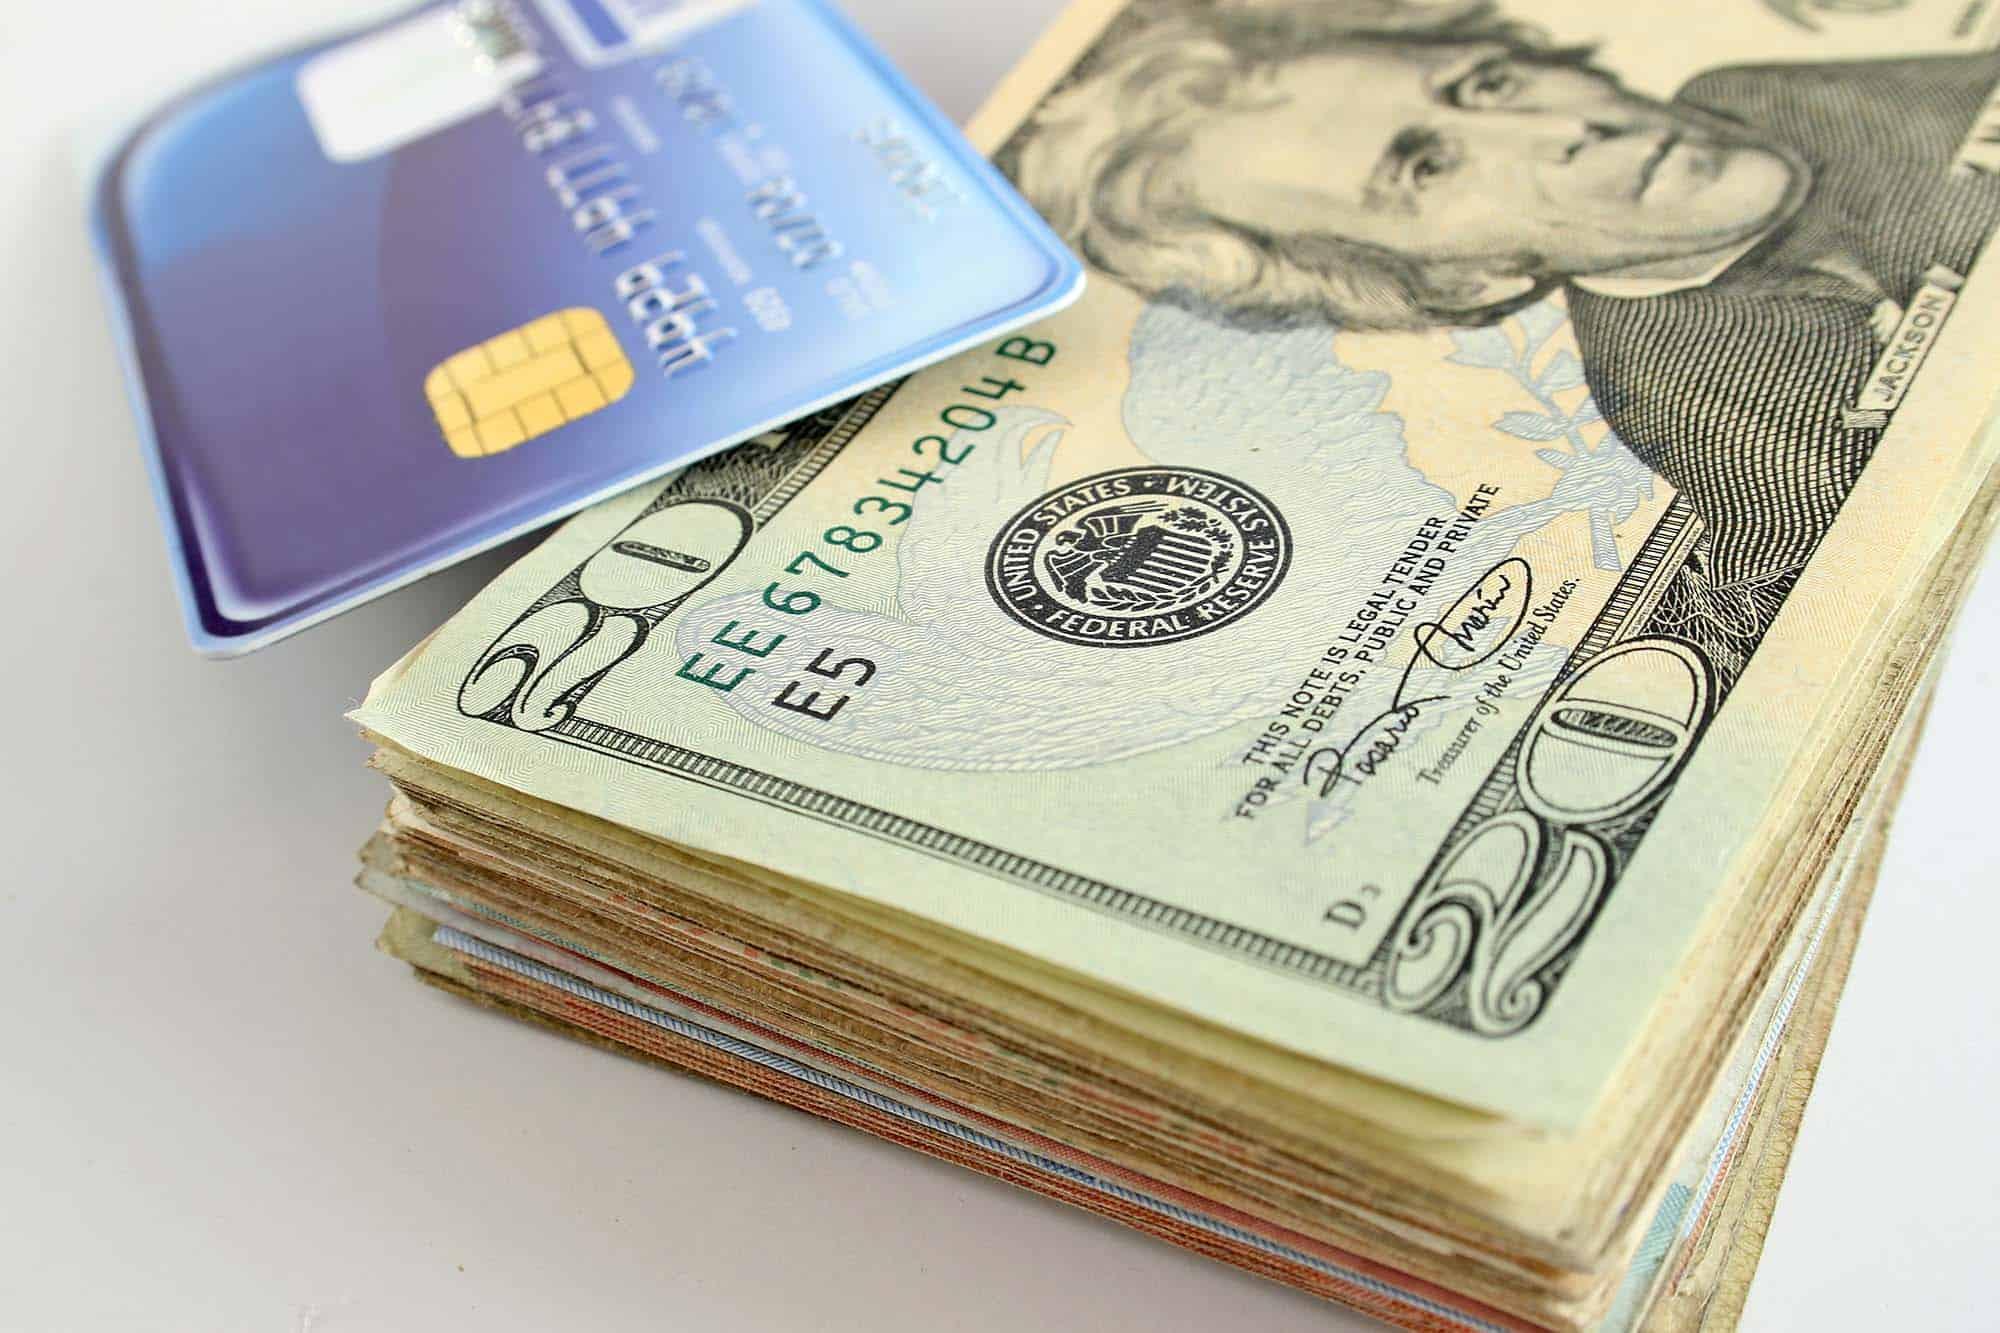 What is a cash advance adelanto de efectivo